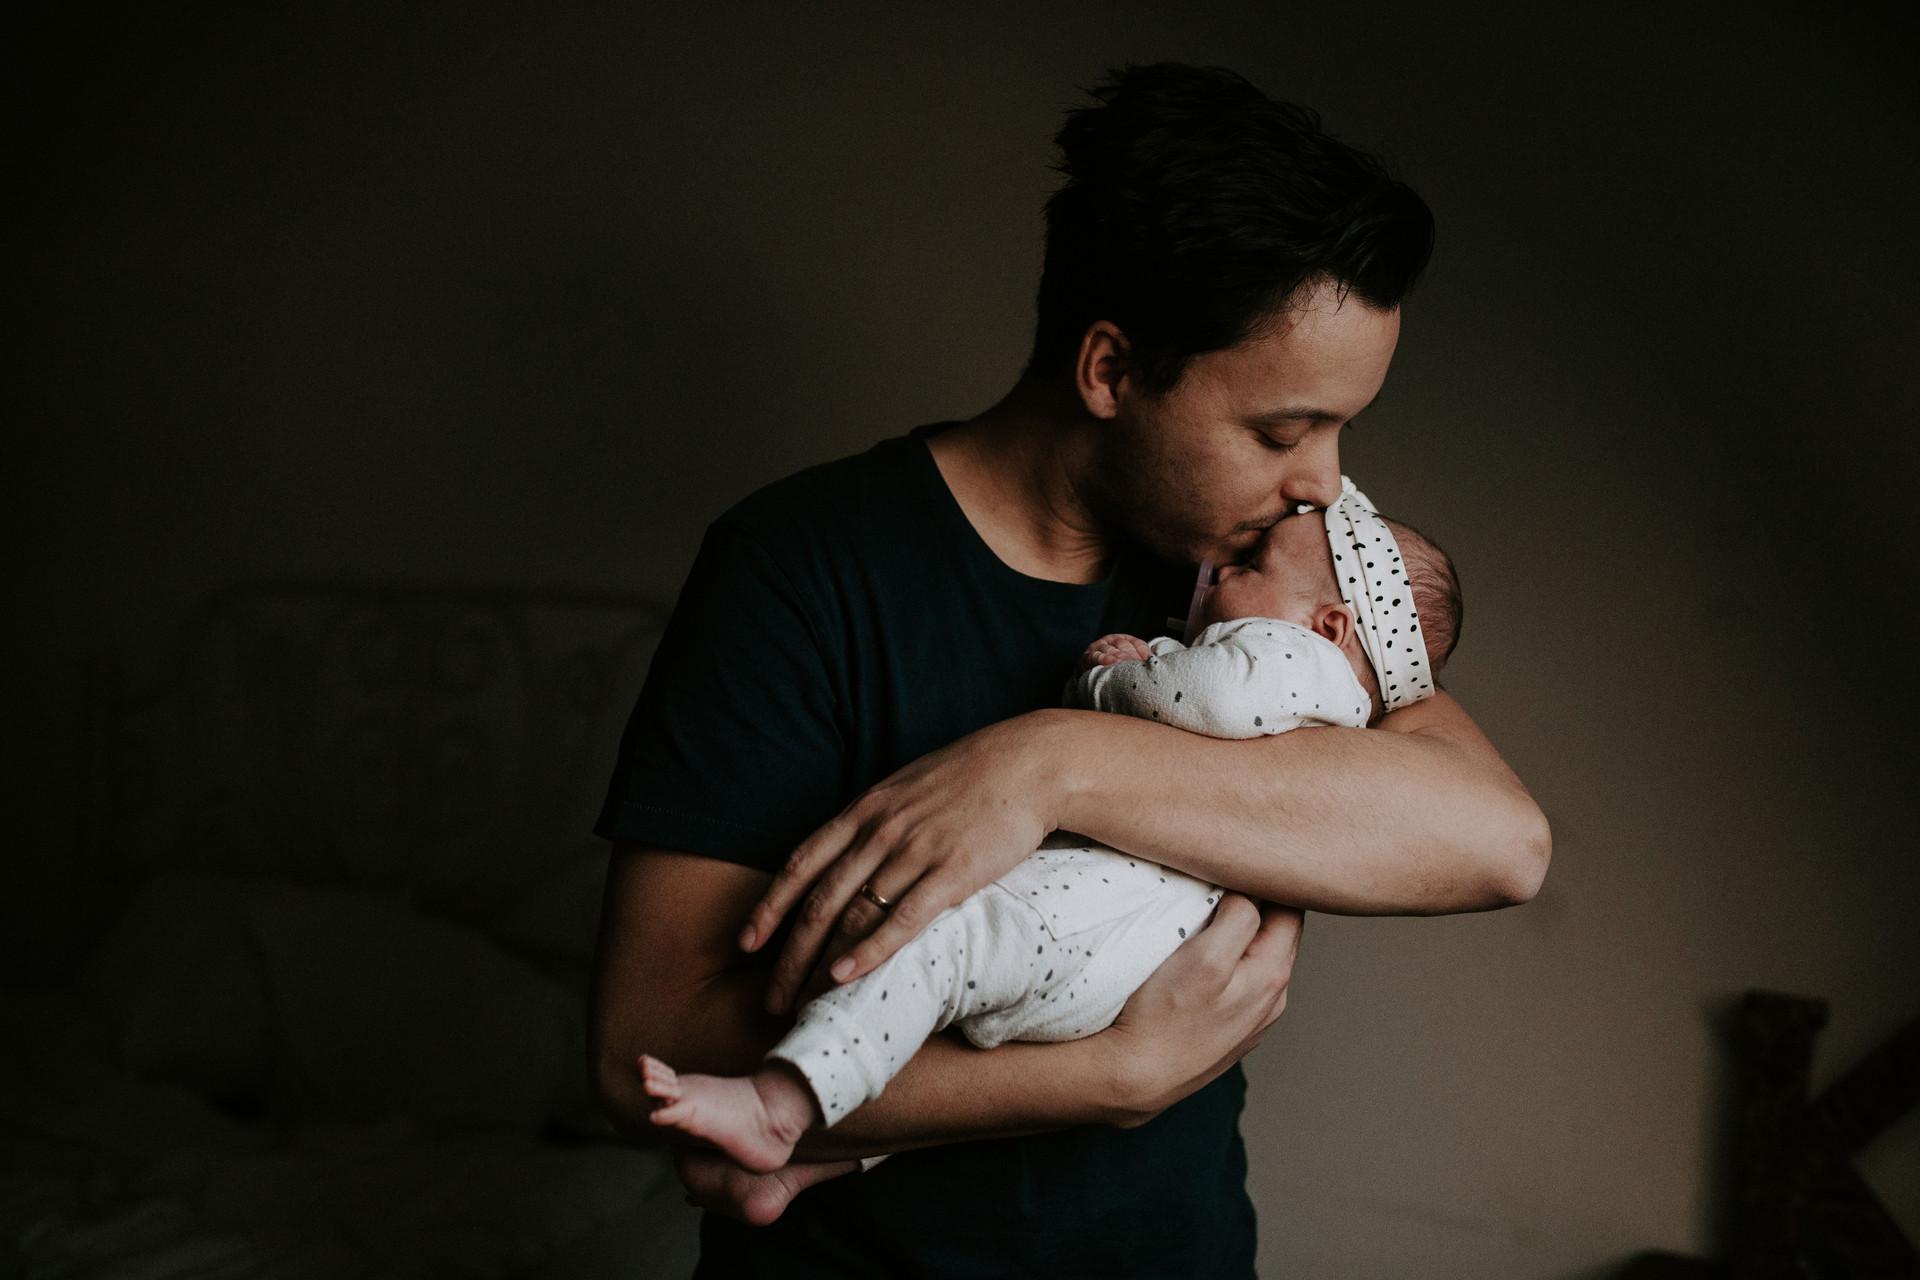 Newbornfotografie Lifestyle newborn, stance photography